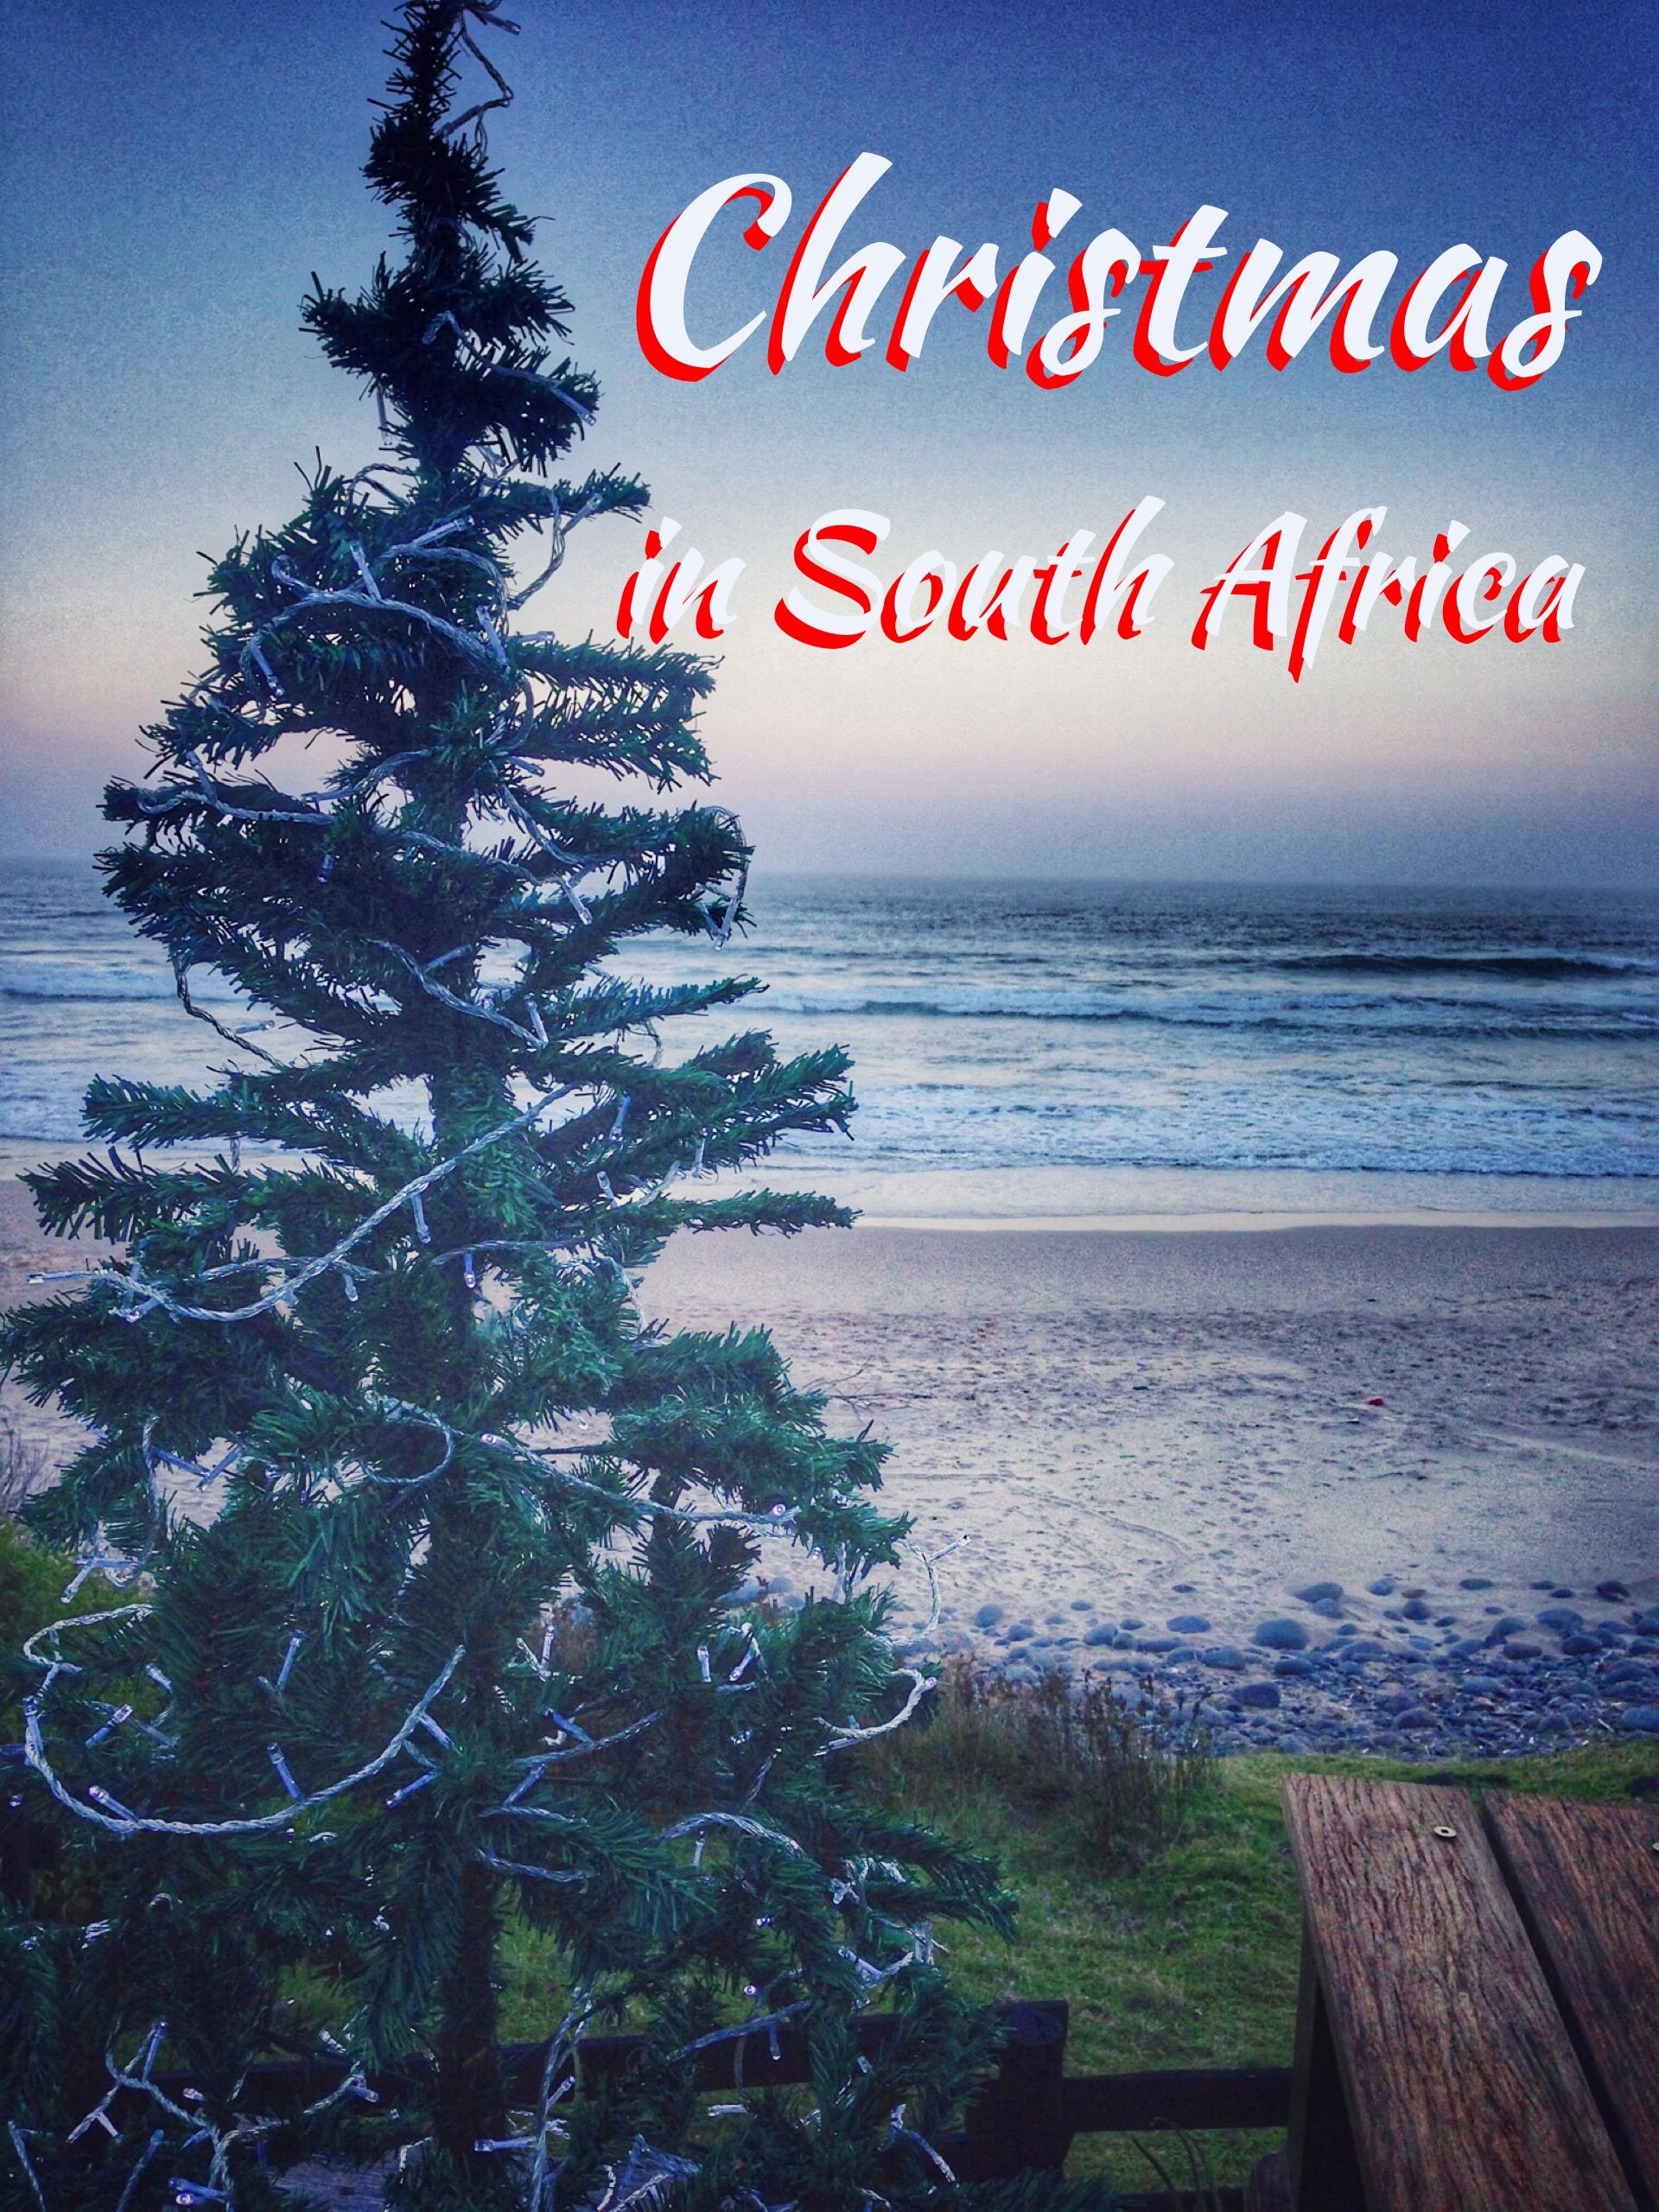 Christmas_South_Africa.JPG